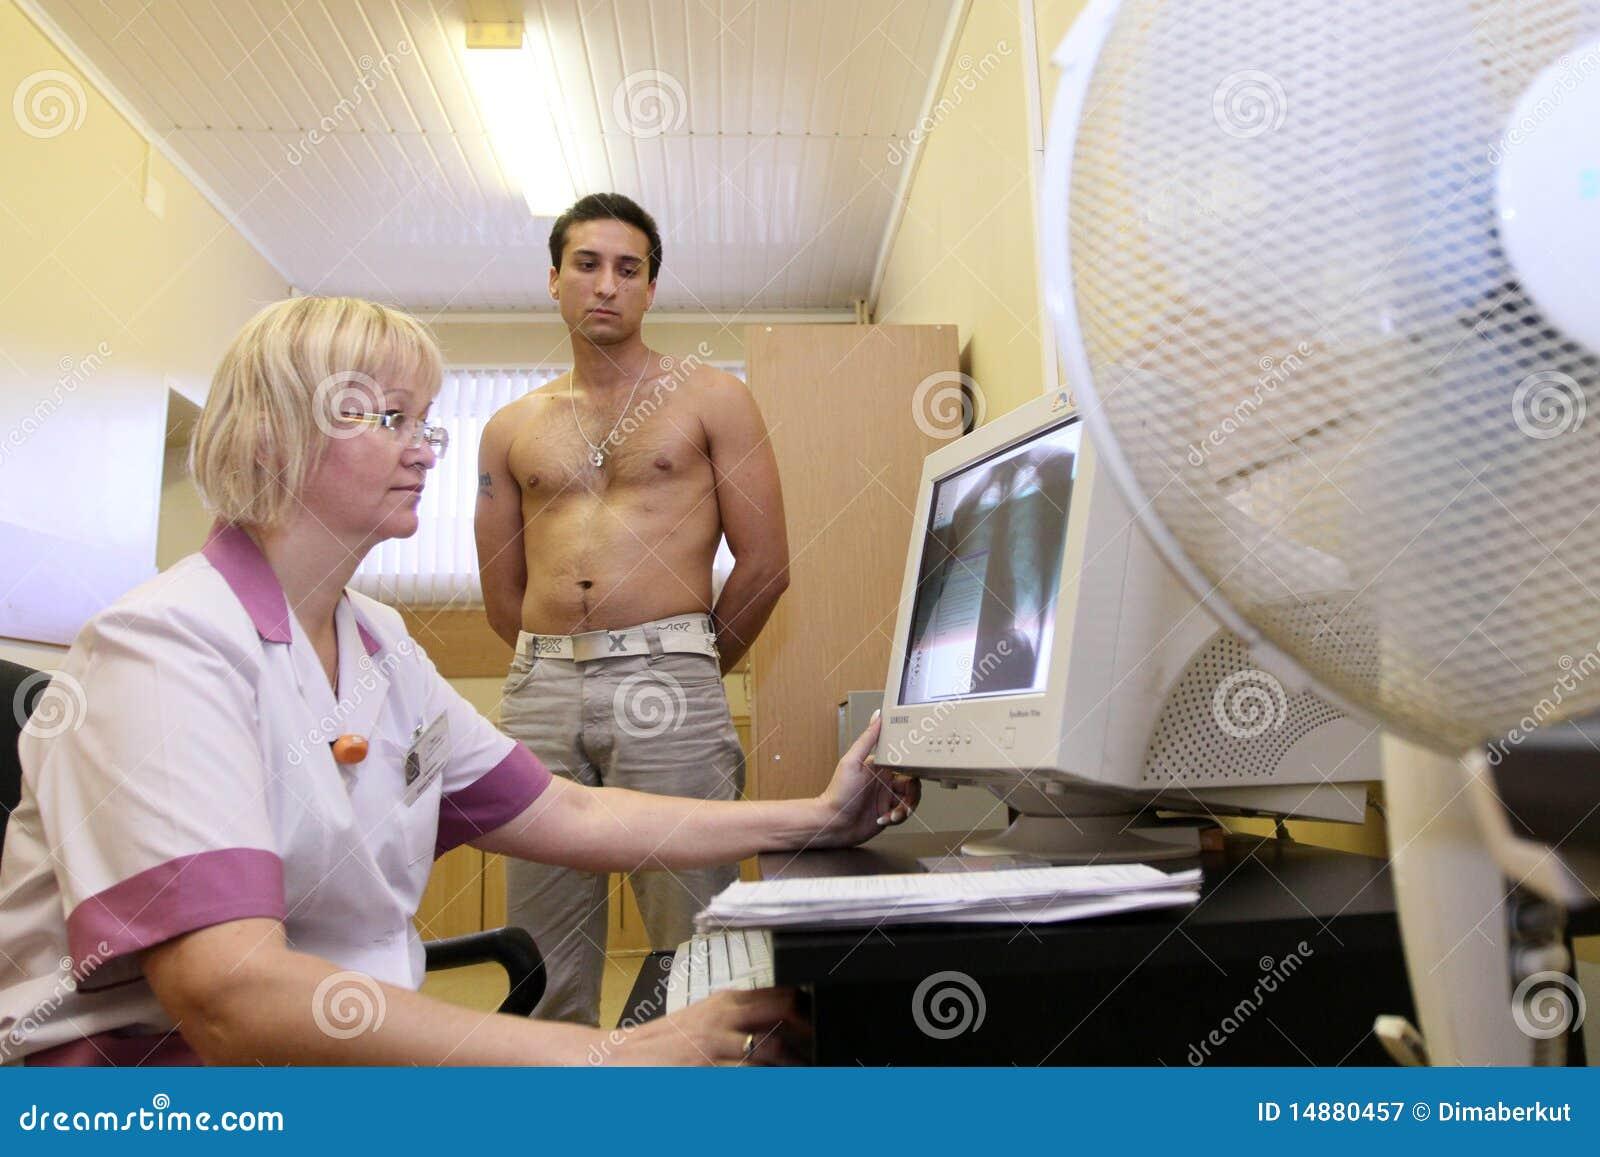 Female Doctor Male Exam